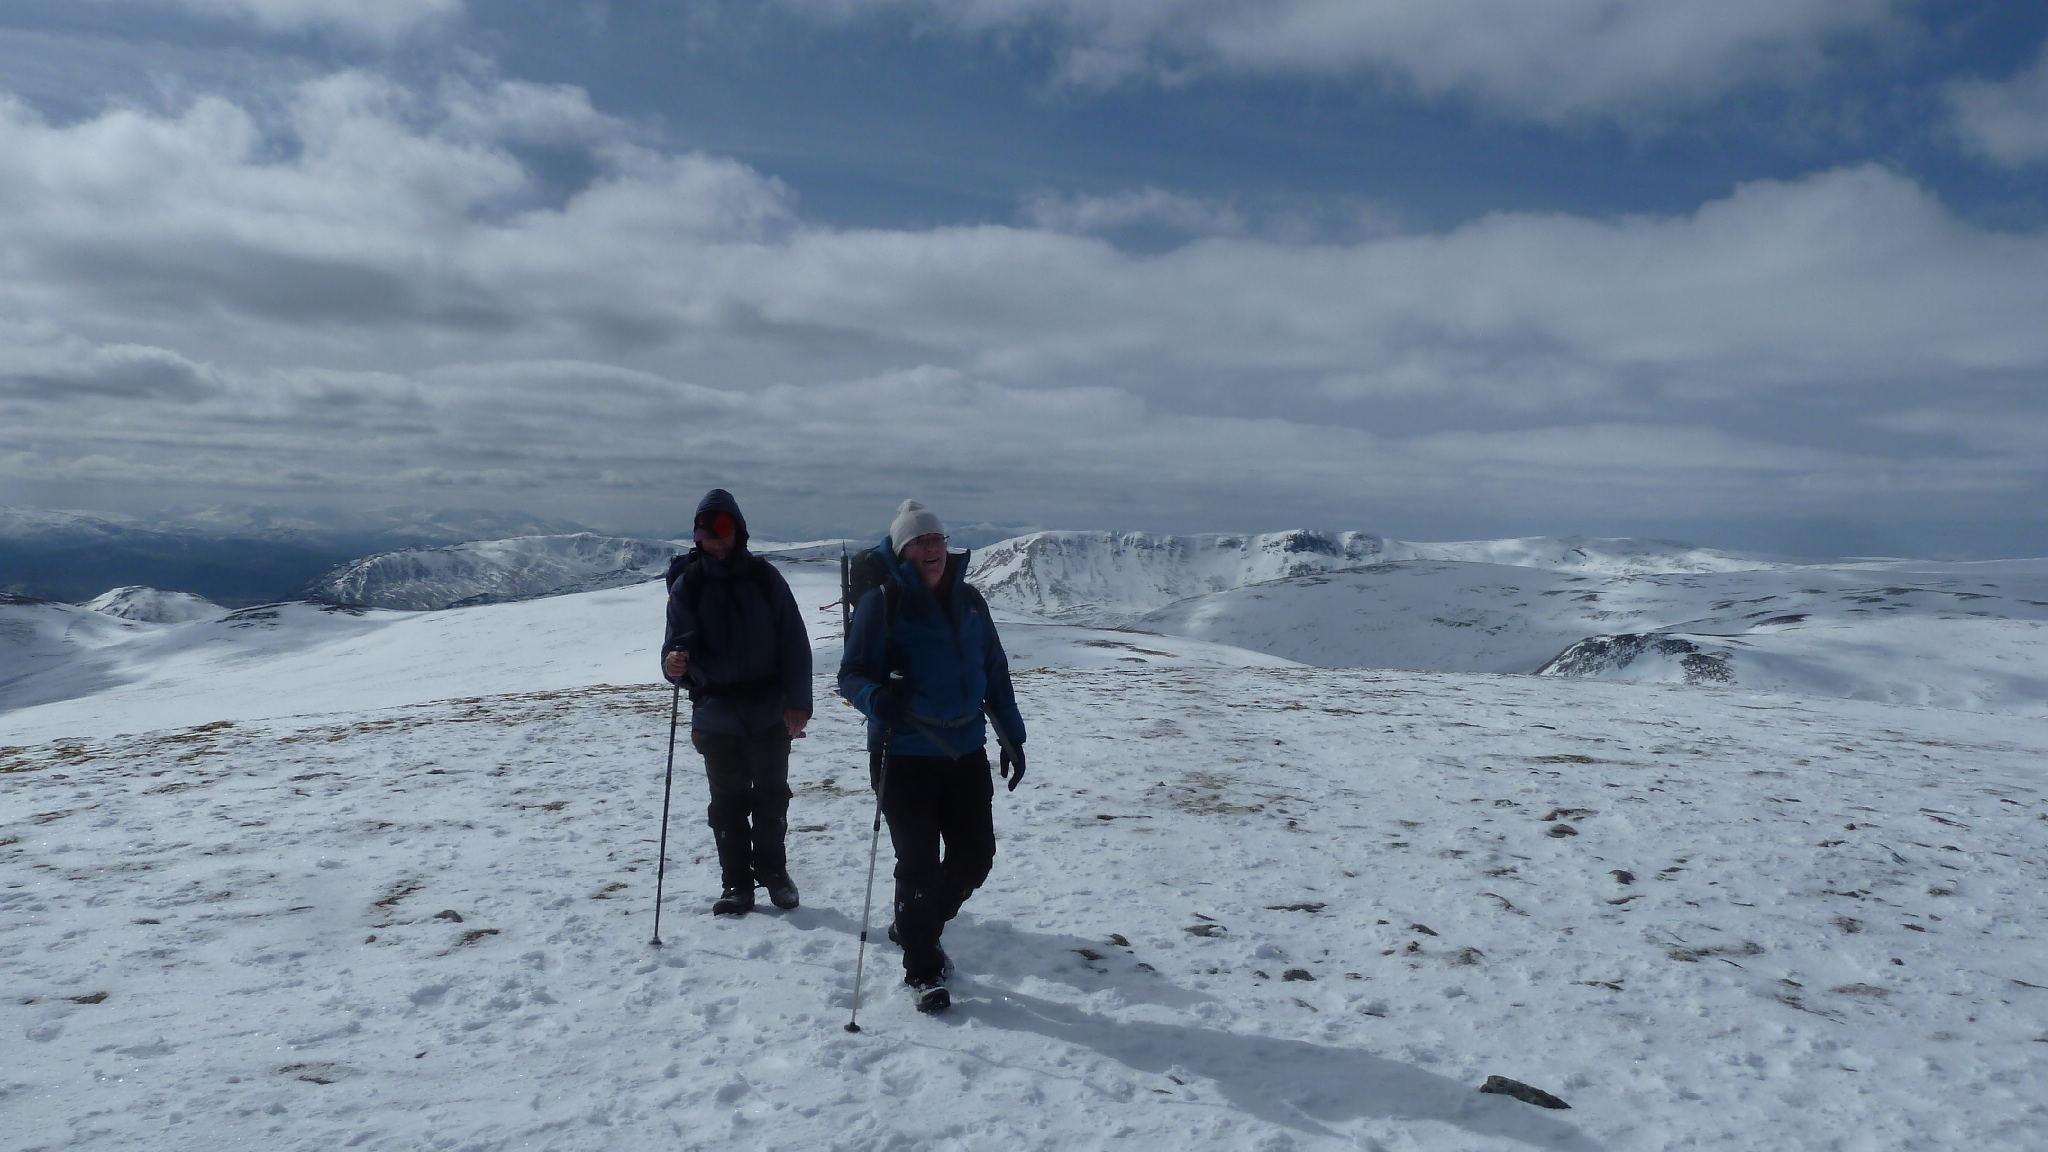 A Chailleach ascent